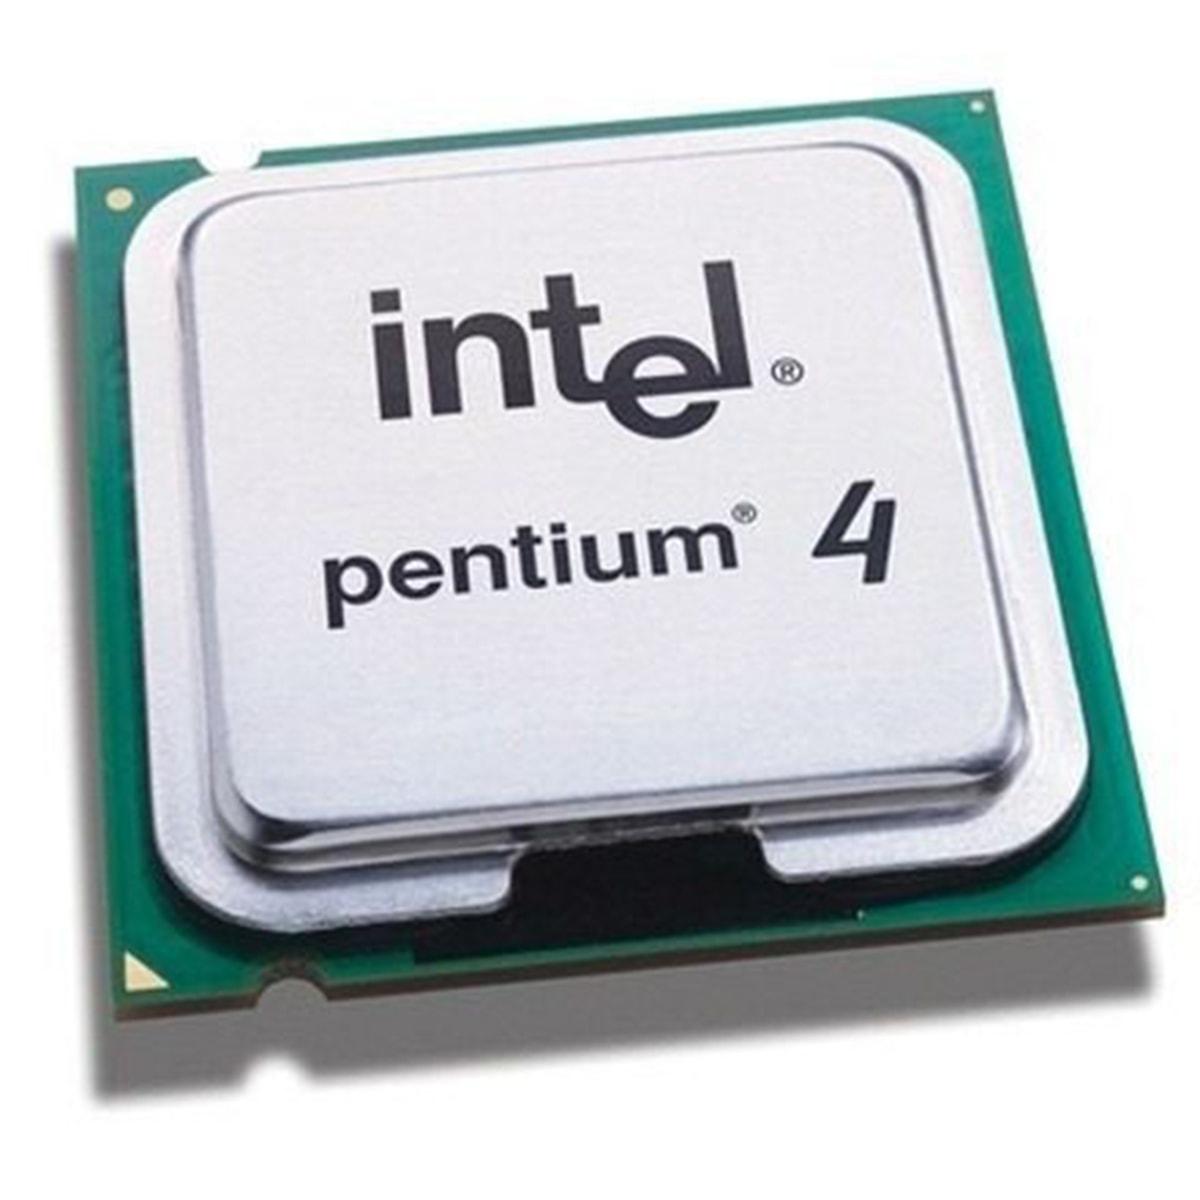 Processador Intel Pentium 4 HT 641 2M Cache / 3.20 GHz / 800 MHz / Socket 775 - Seminovo